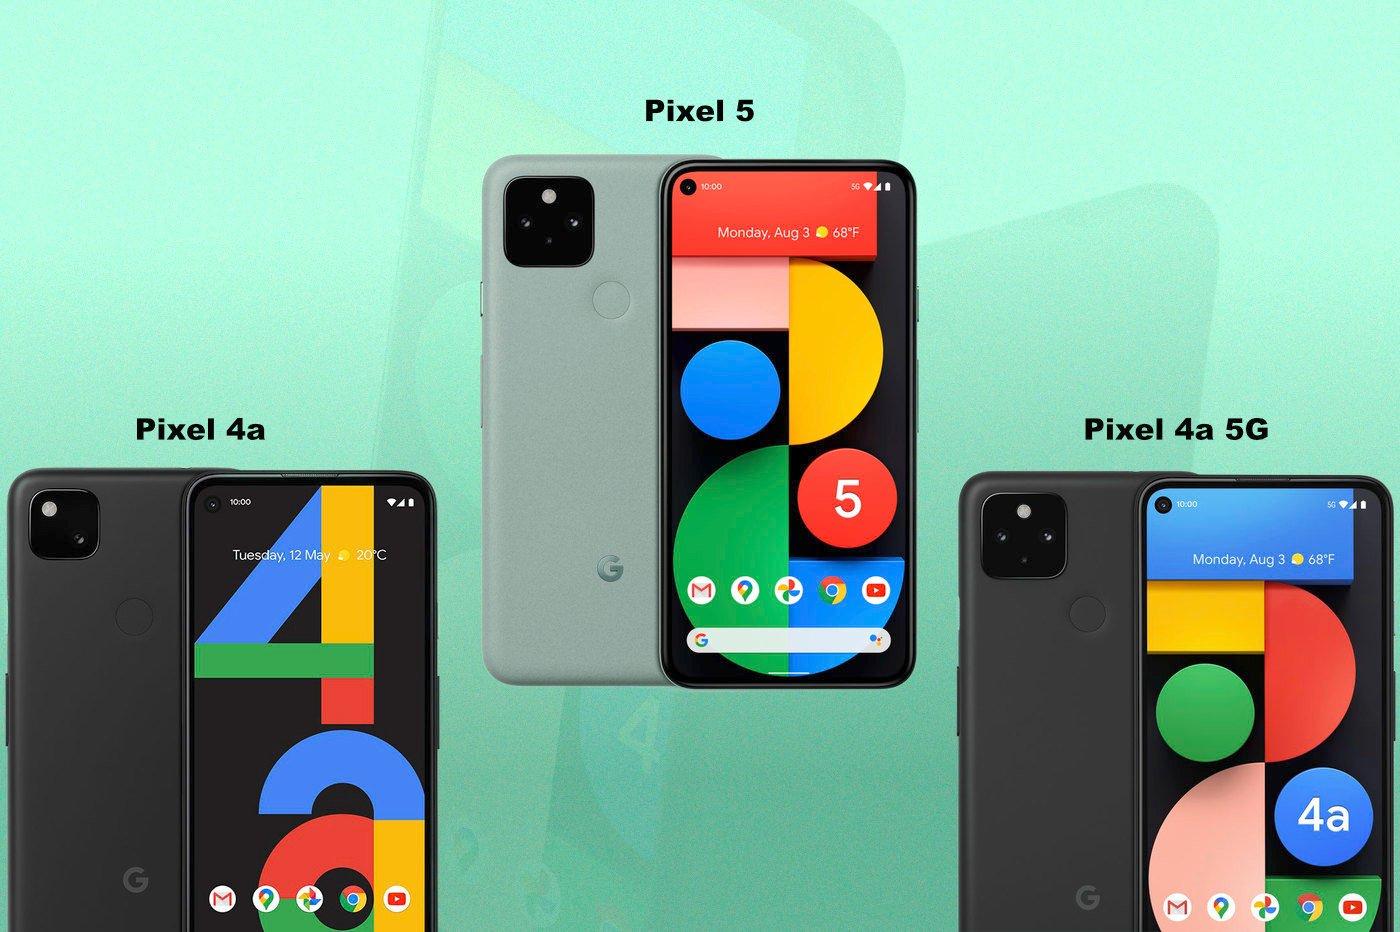 Pixel 5 vs Pixel 4a vs Pixel 4a 5G